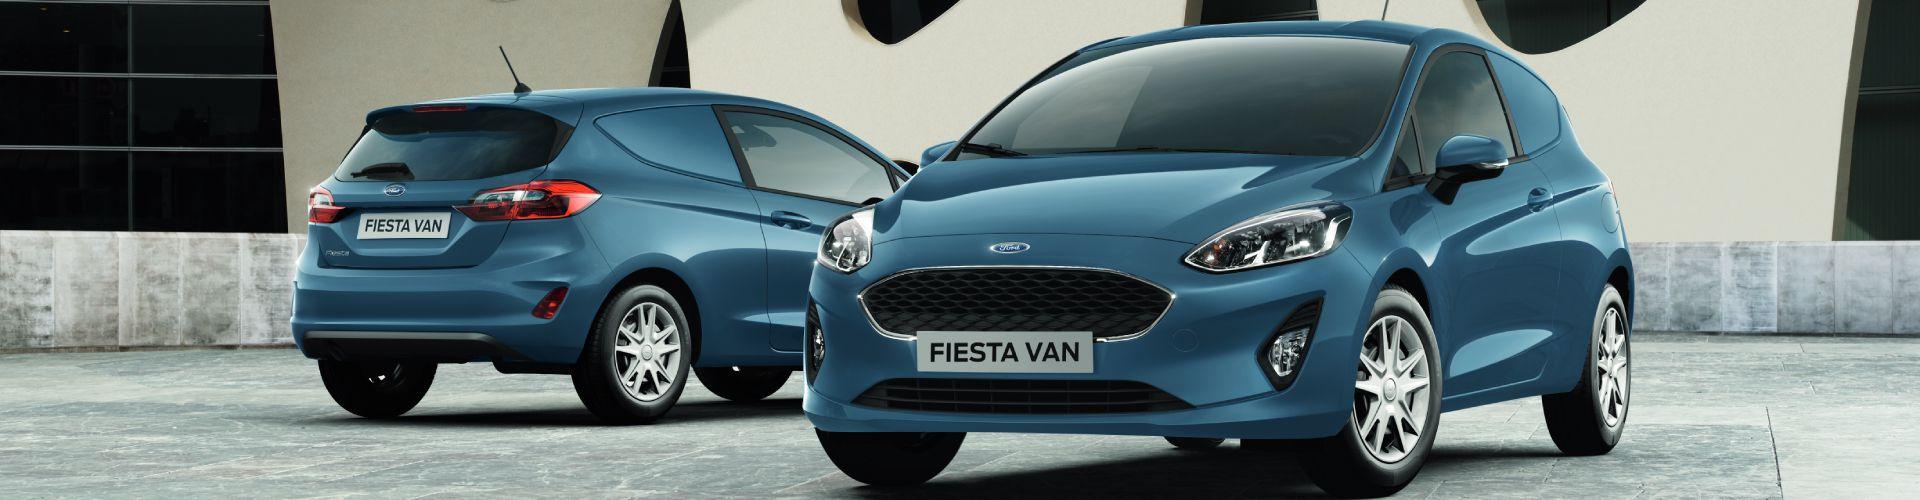 Ford Fiesta Van - A. Αντιπροσωπεία Λιάπη